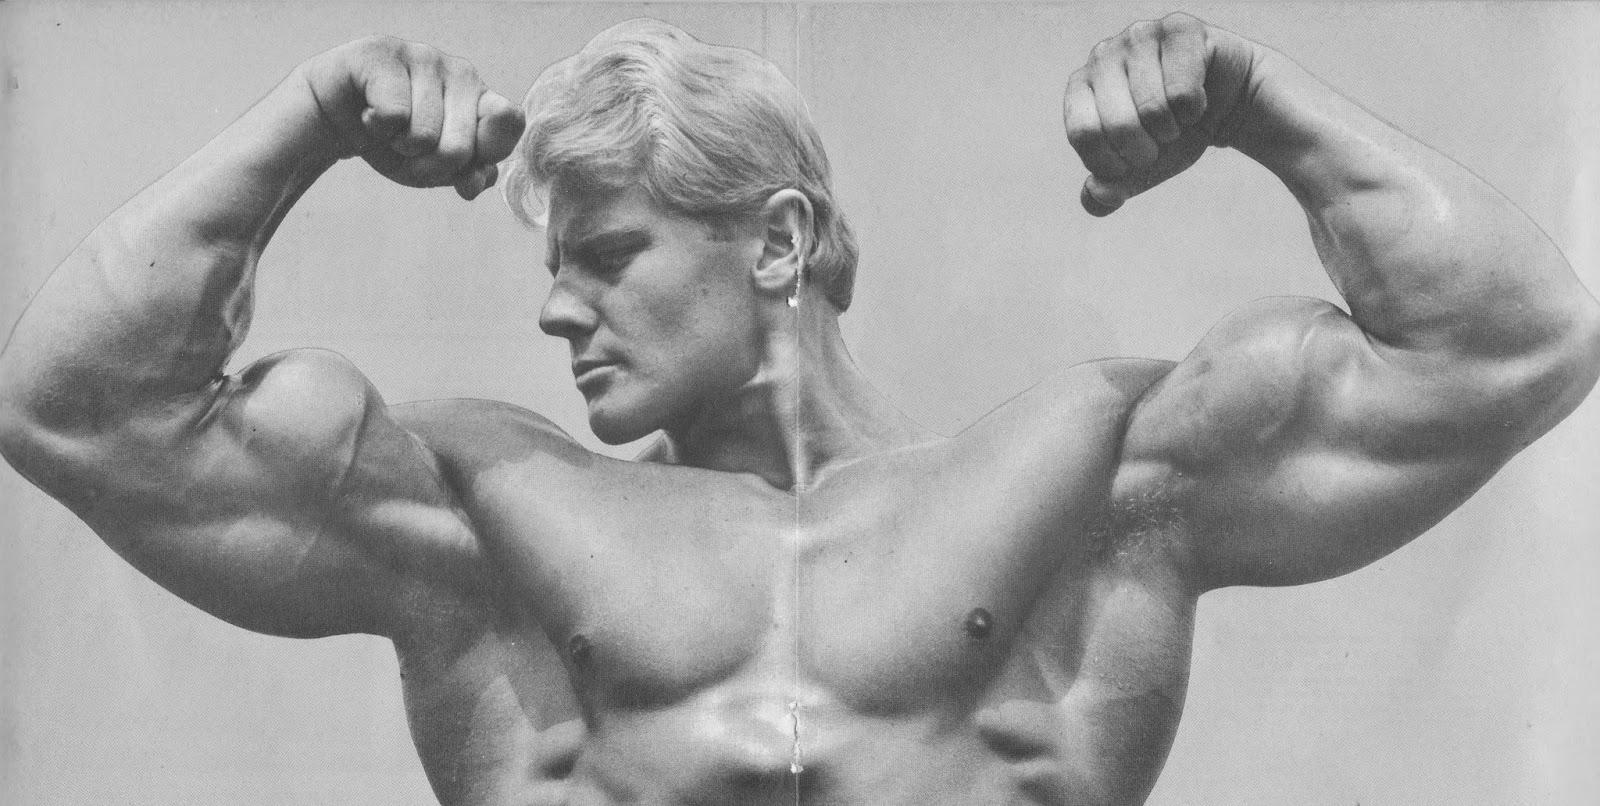 Don Draper Office The Tight Tan Slacks Of Dezso Ban Power For Bigger Biceps